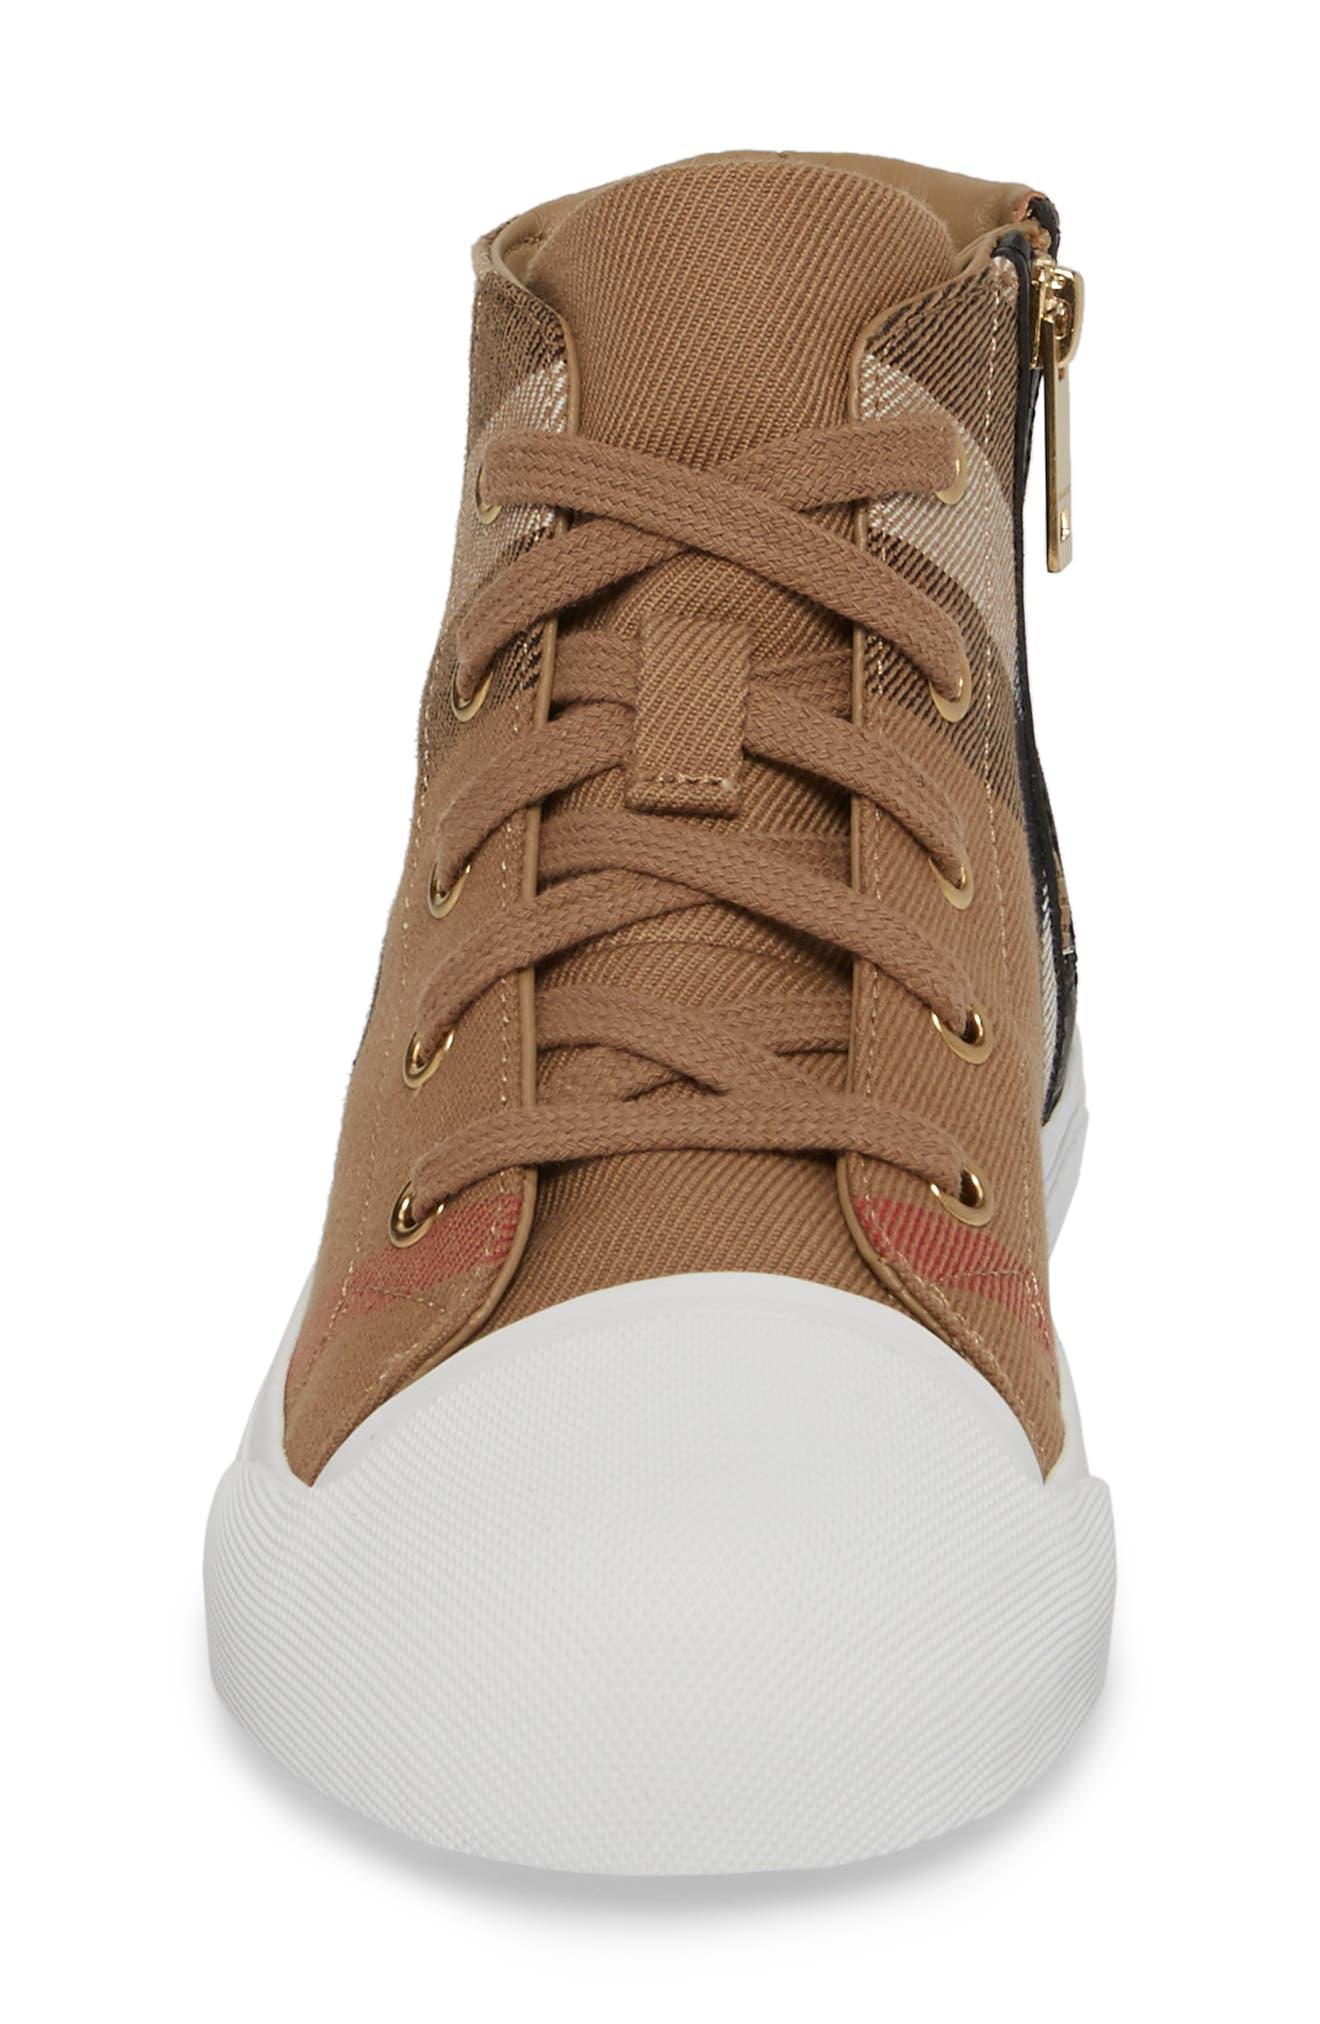 Belford High Top Sneaker,                             Alternate thumbnail 4, color,                             300